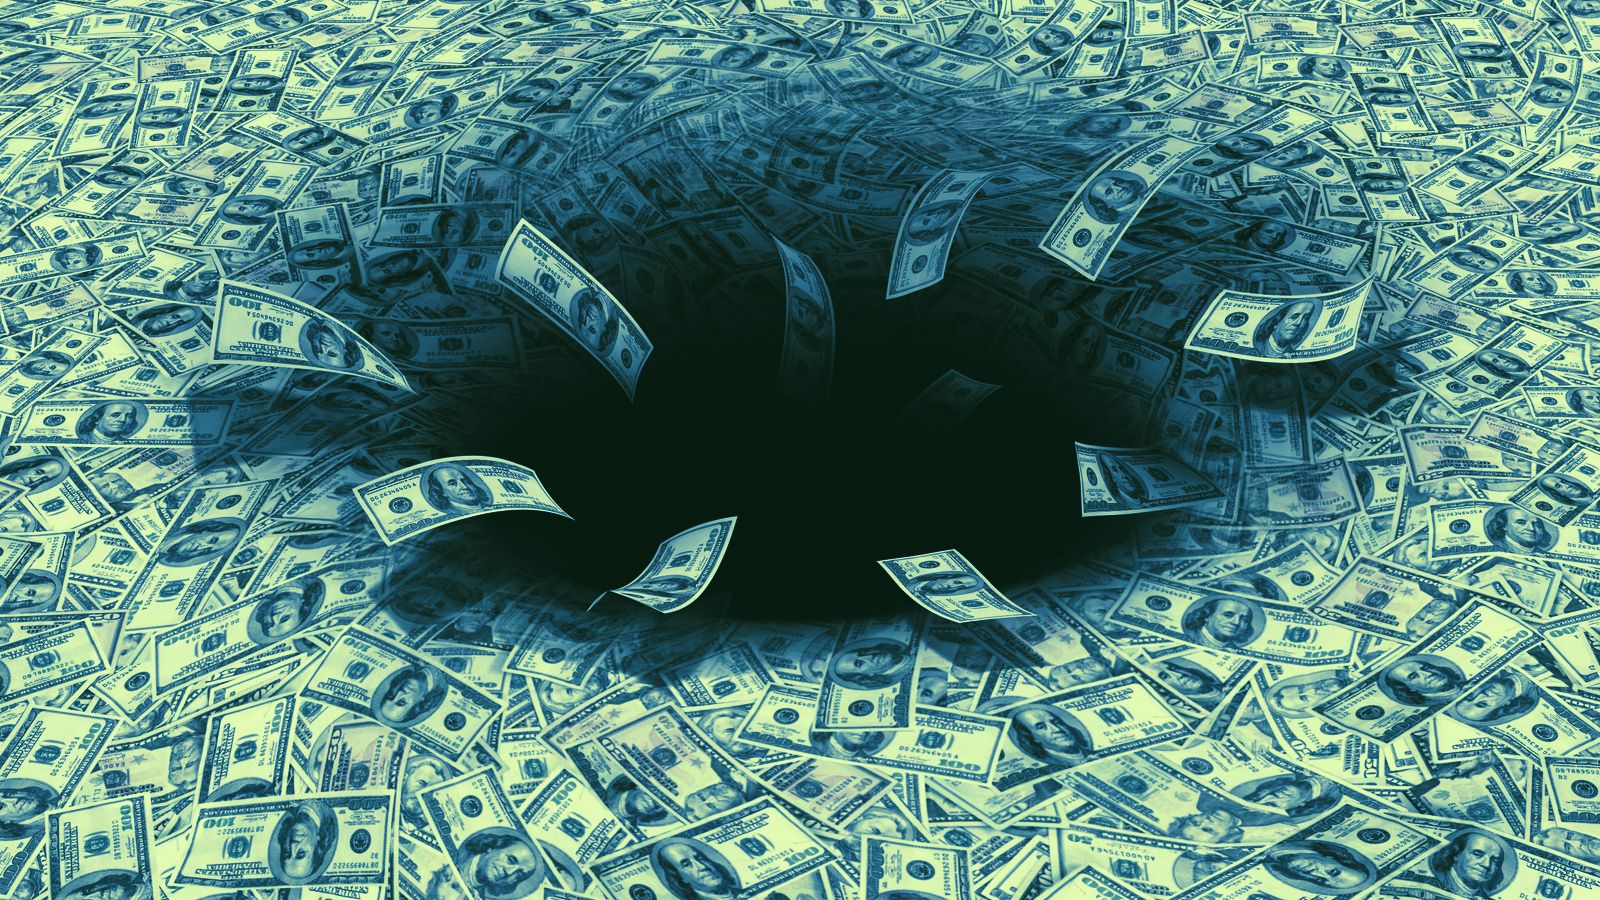 Mt. Gox Creditors Suffer $1.2 Million in Fees Since March - Decrypt